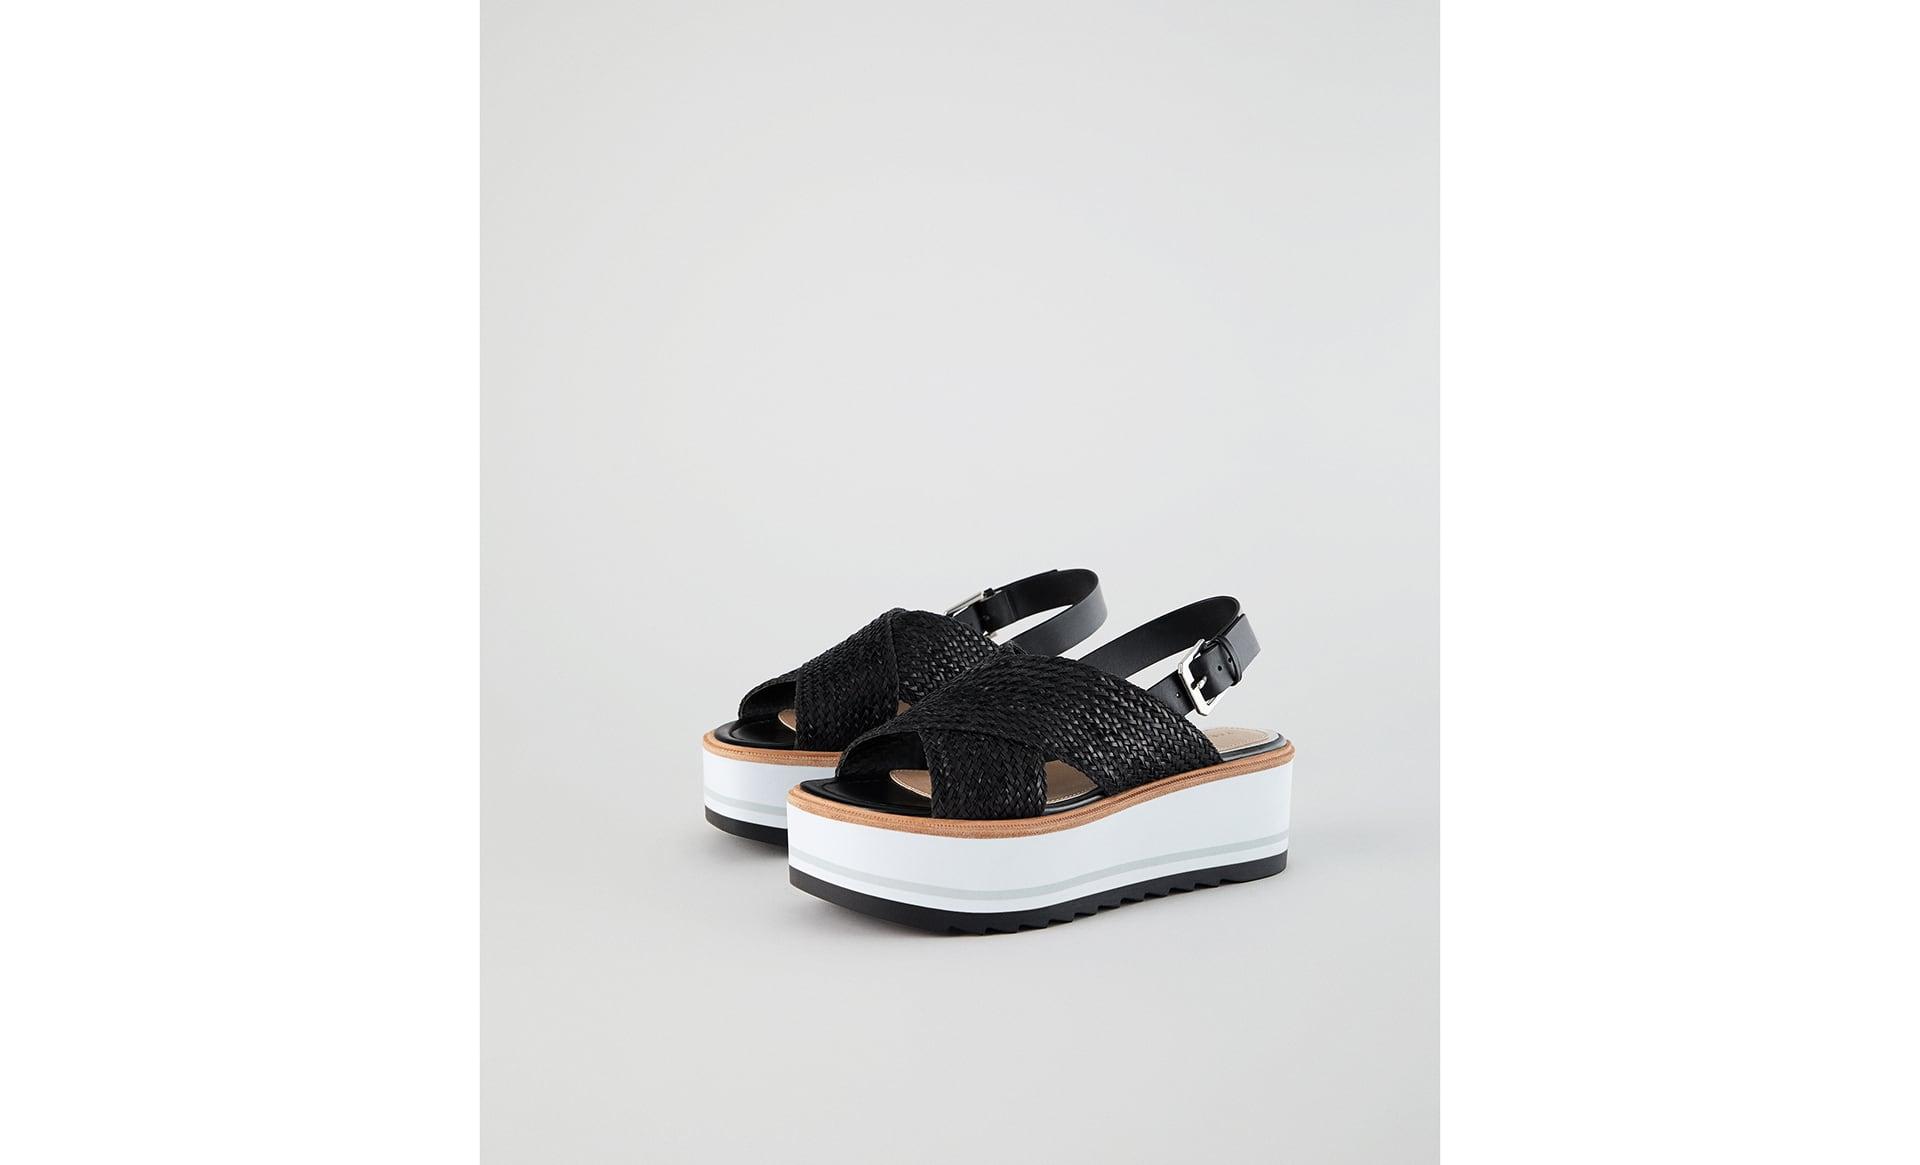 https://www.zara.com/ca/en/plaited-flatform-sandals-p11339301.html?v1=5689569&v2=358014